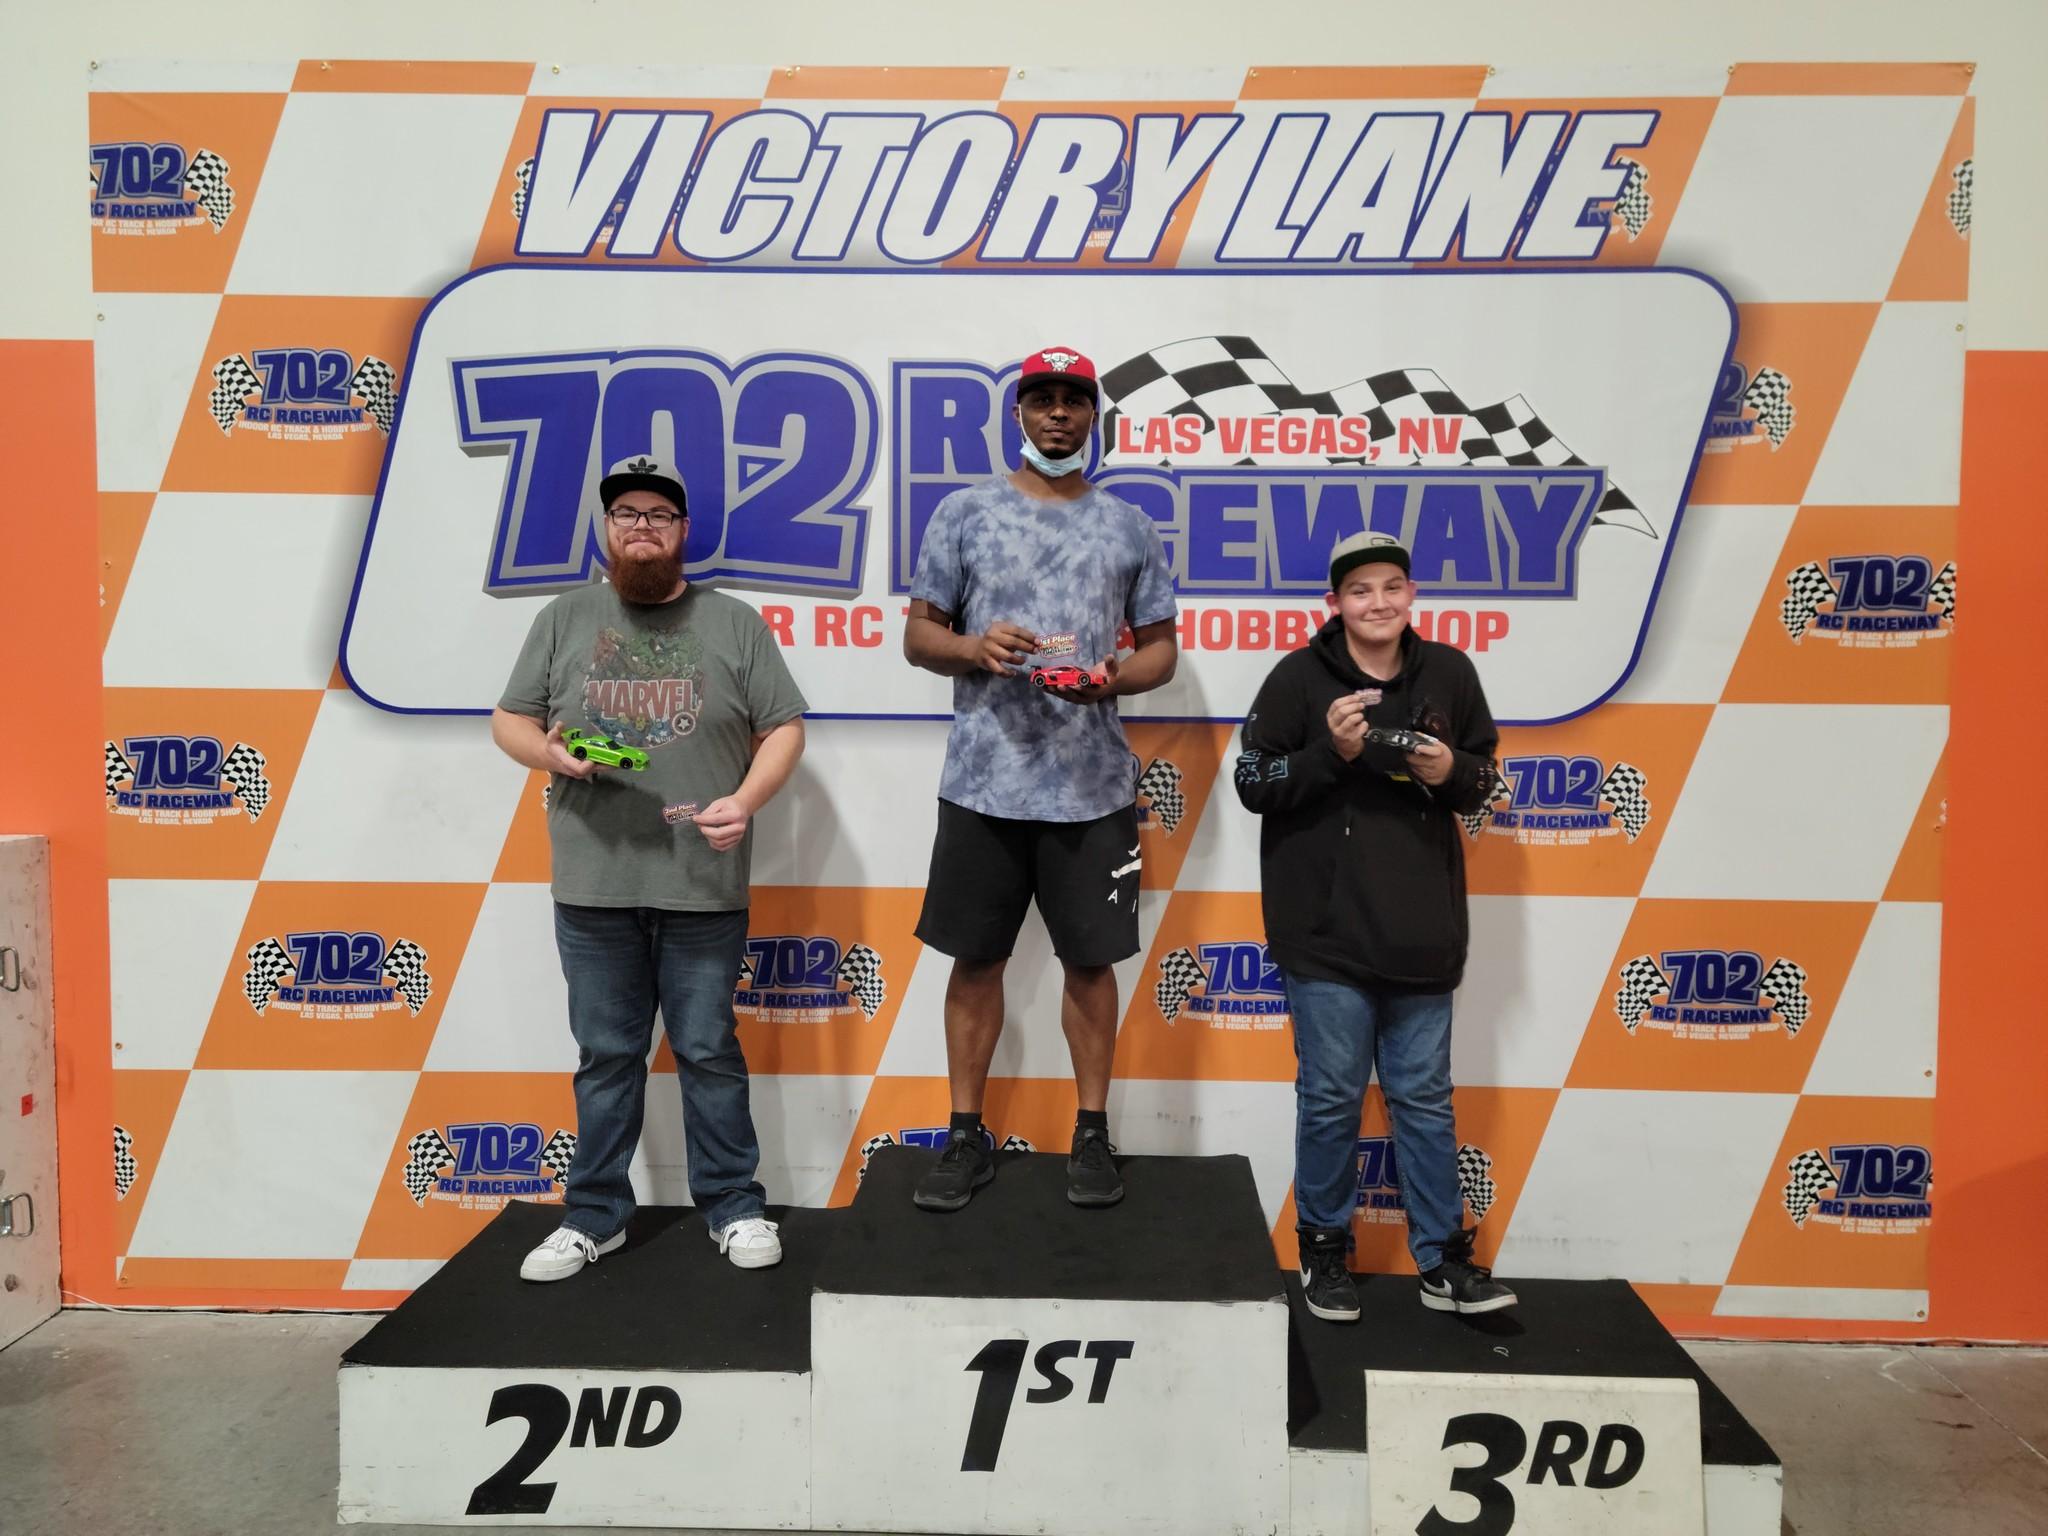 Las Vegas Nights Mini Z - Oct 9, 21 - Race Results